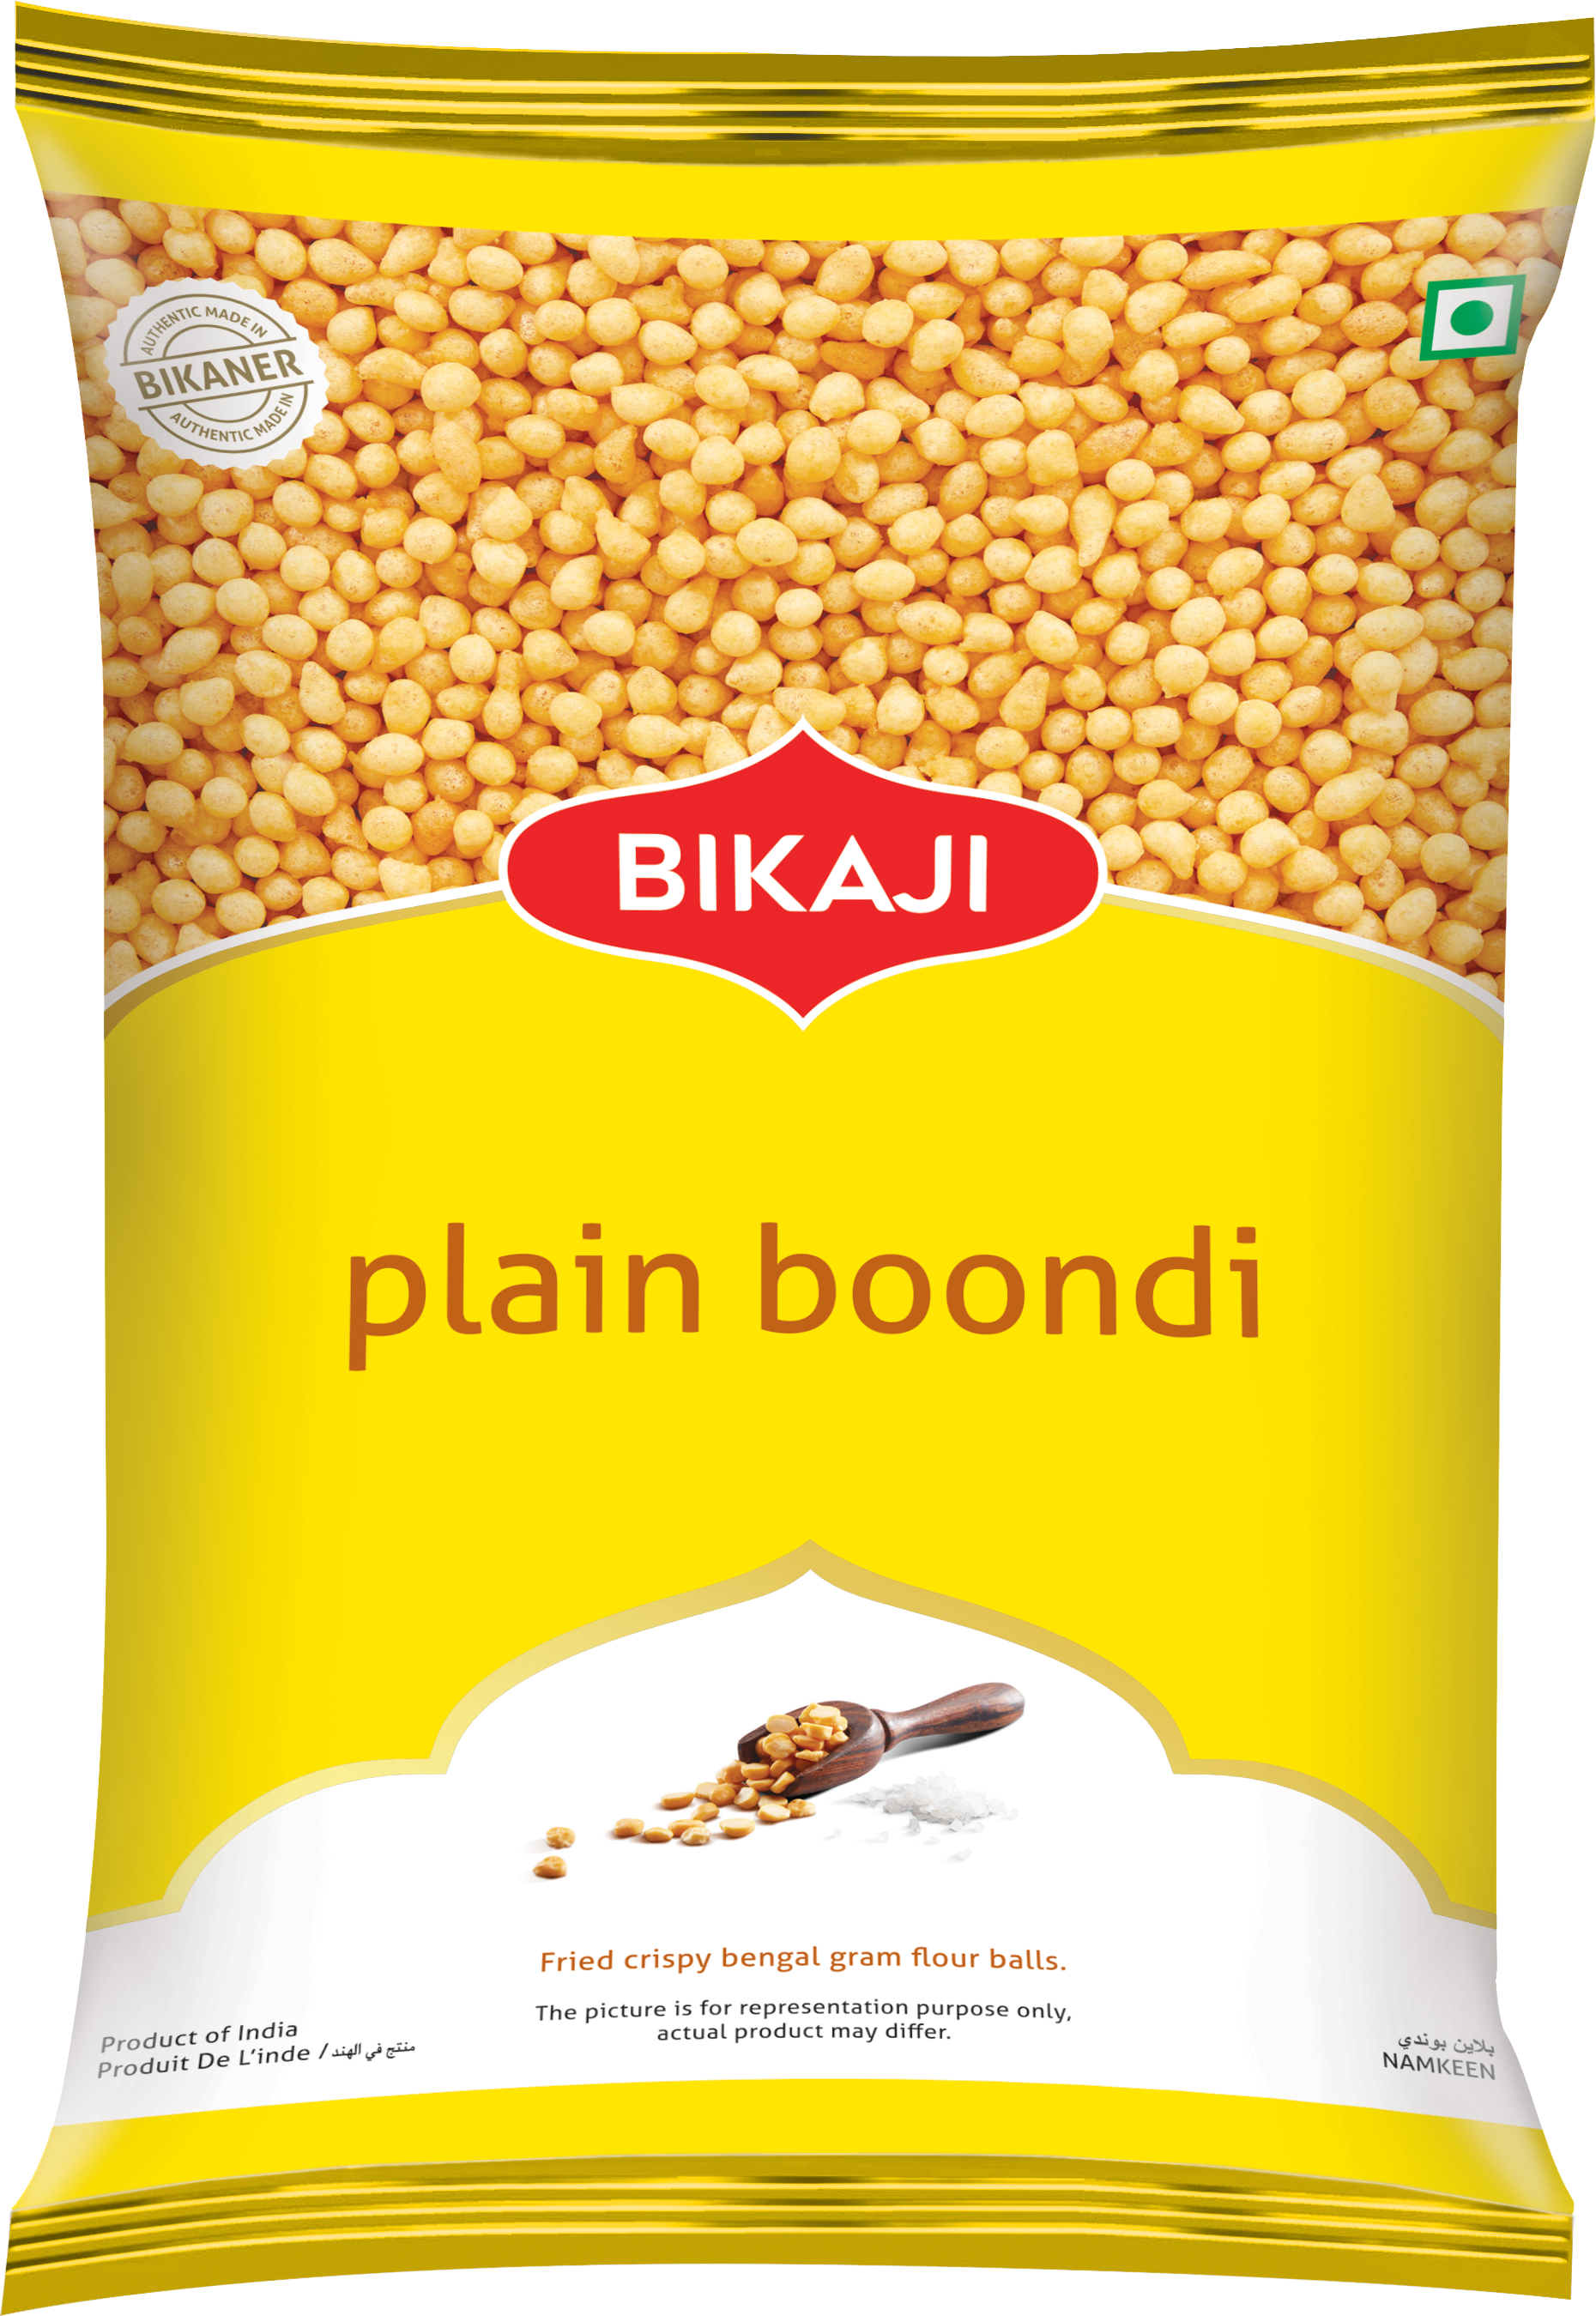 Plain boondi